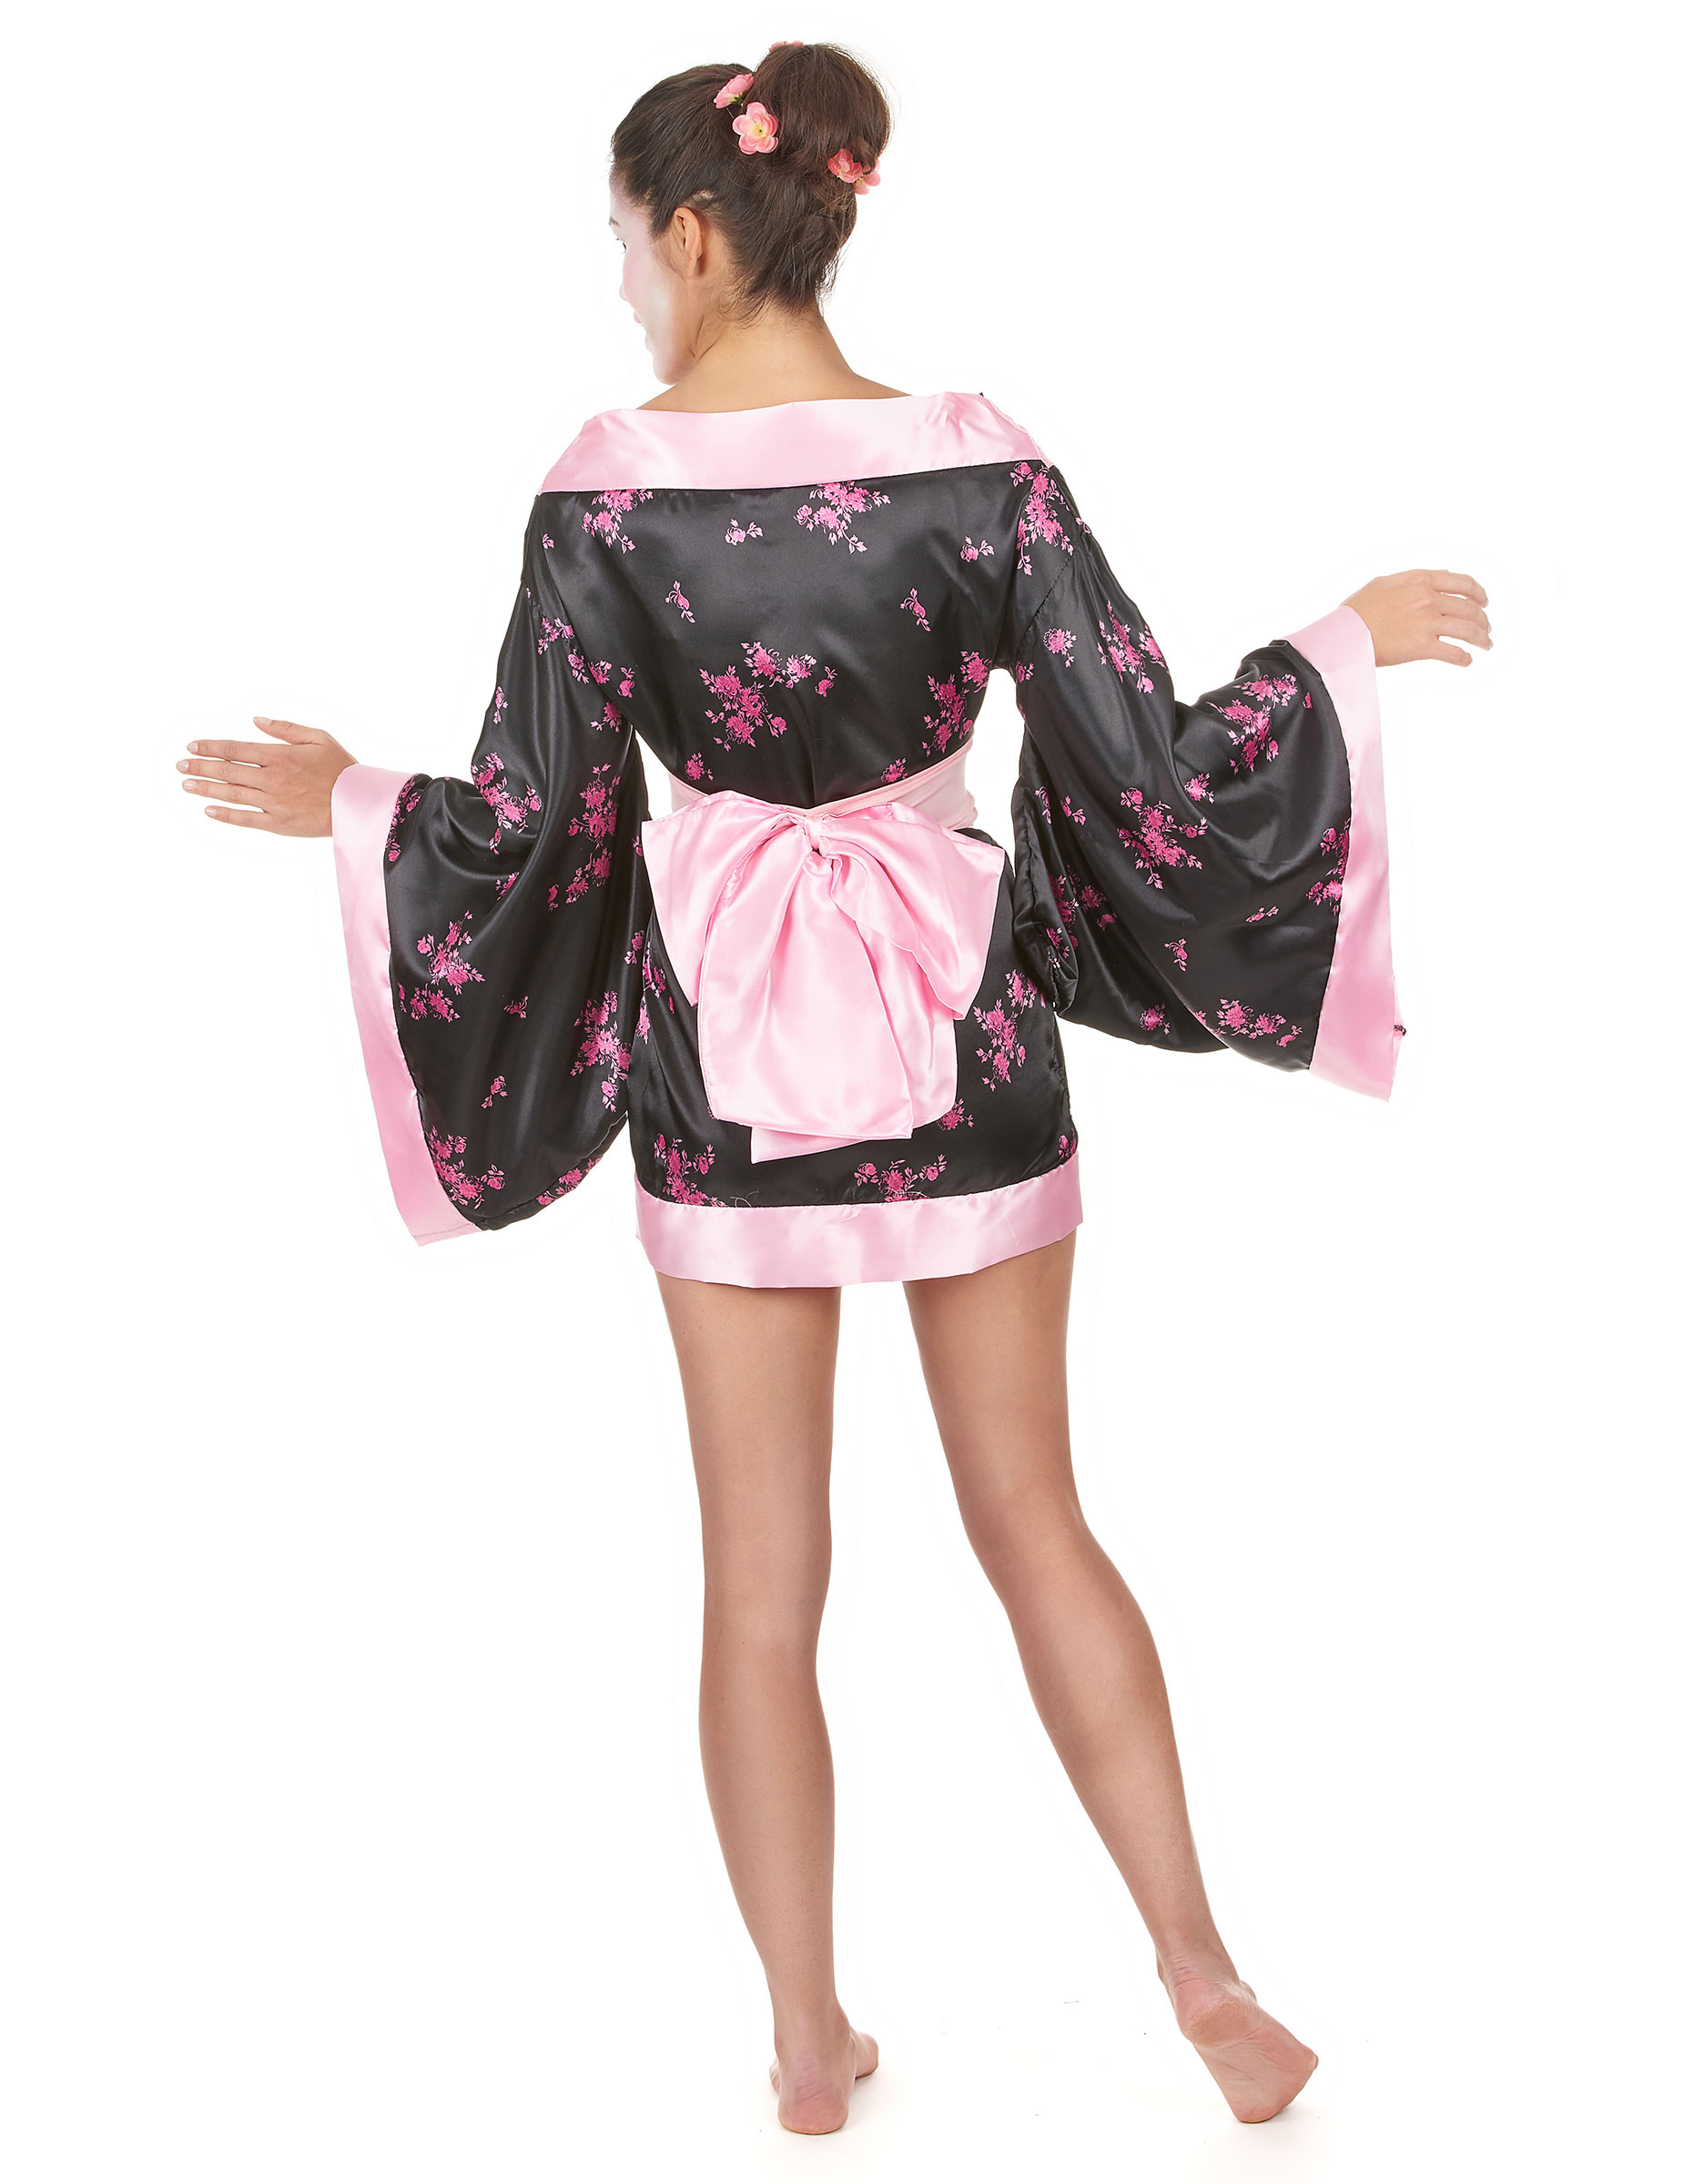 edles geisha damen kost m schwarz rosa g nstige faschings kost me bei karneval megastore. Black Bedroom Furniture Sets. Home Design Ideas